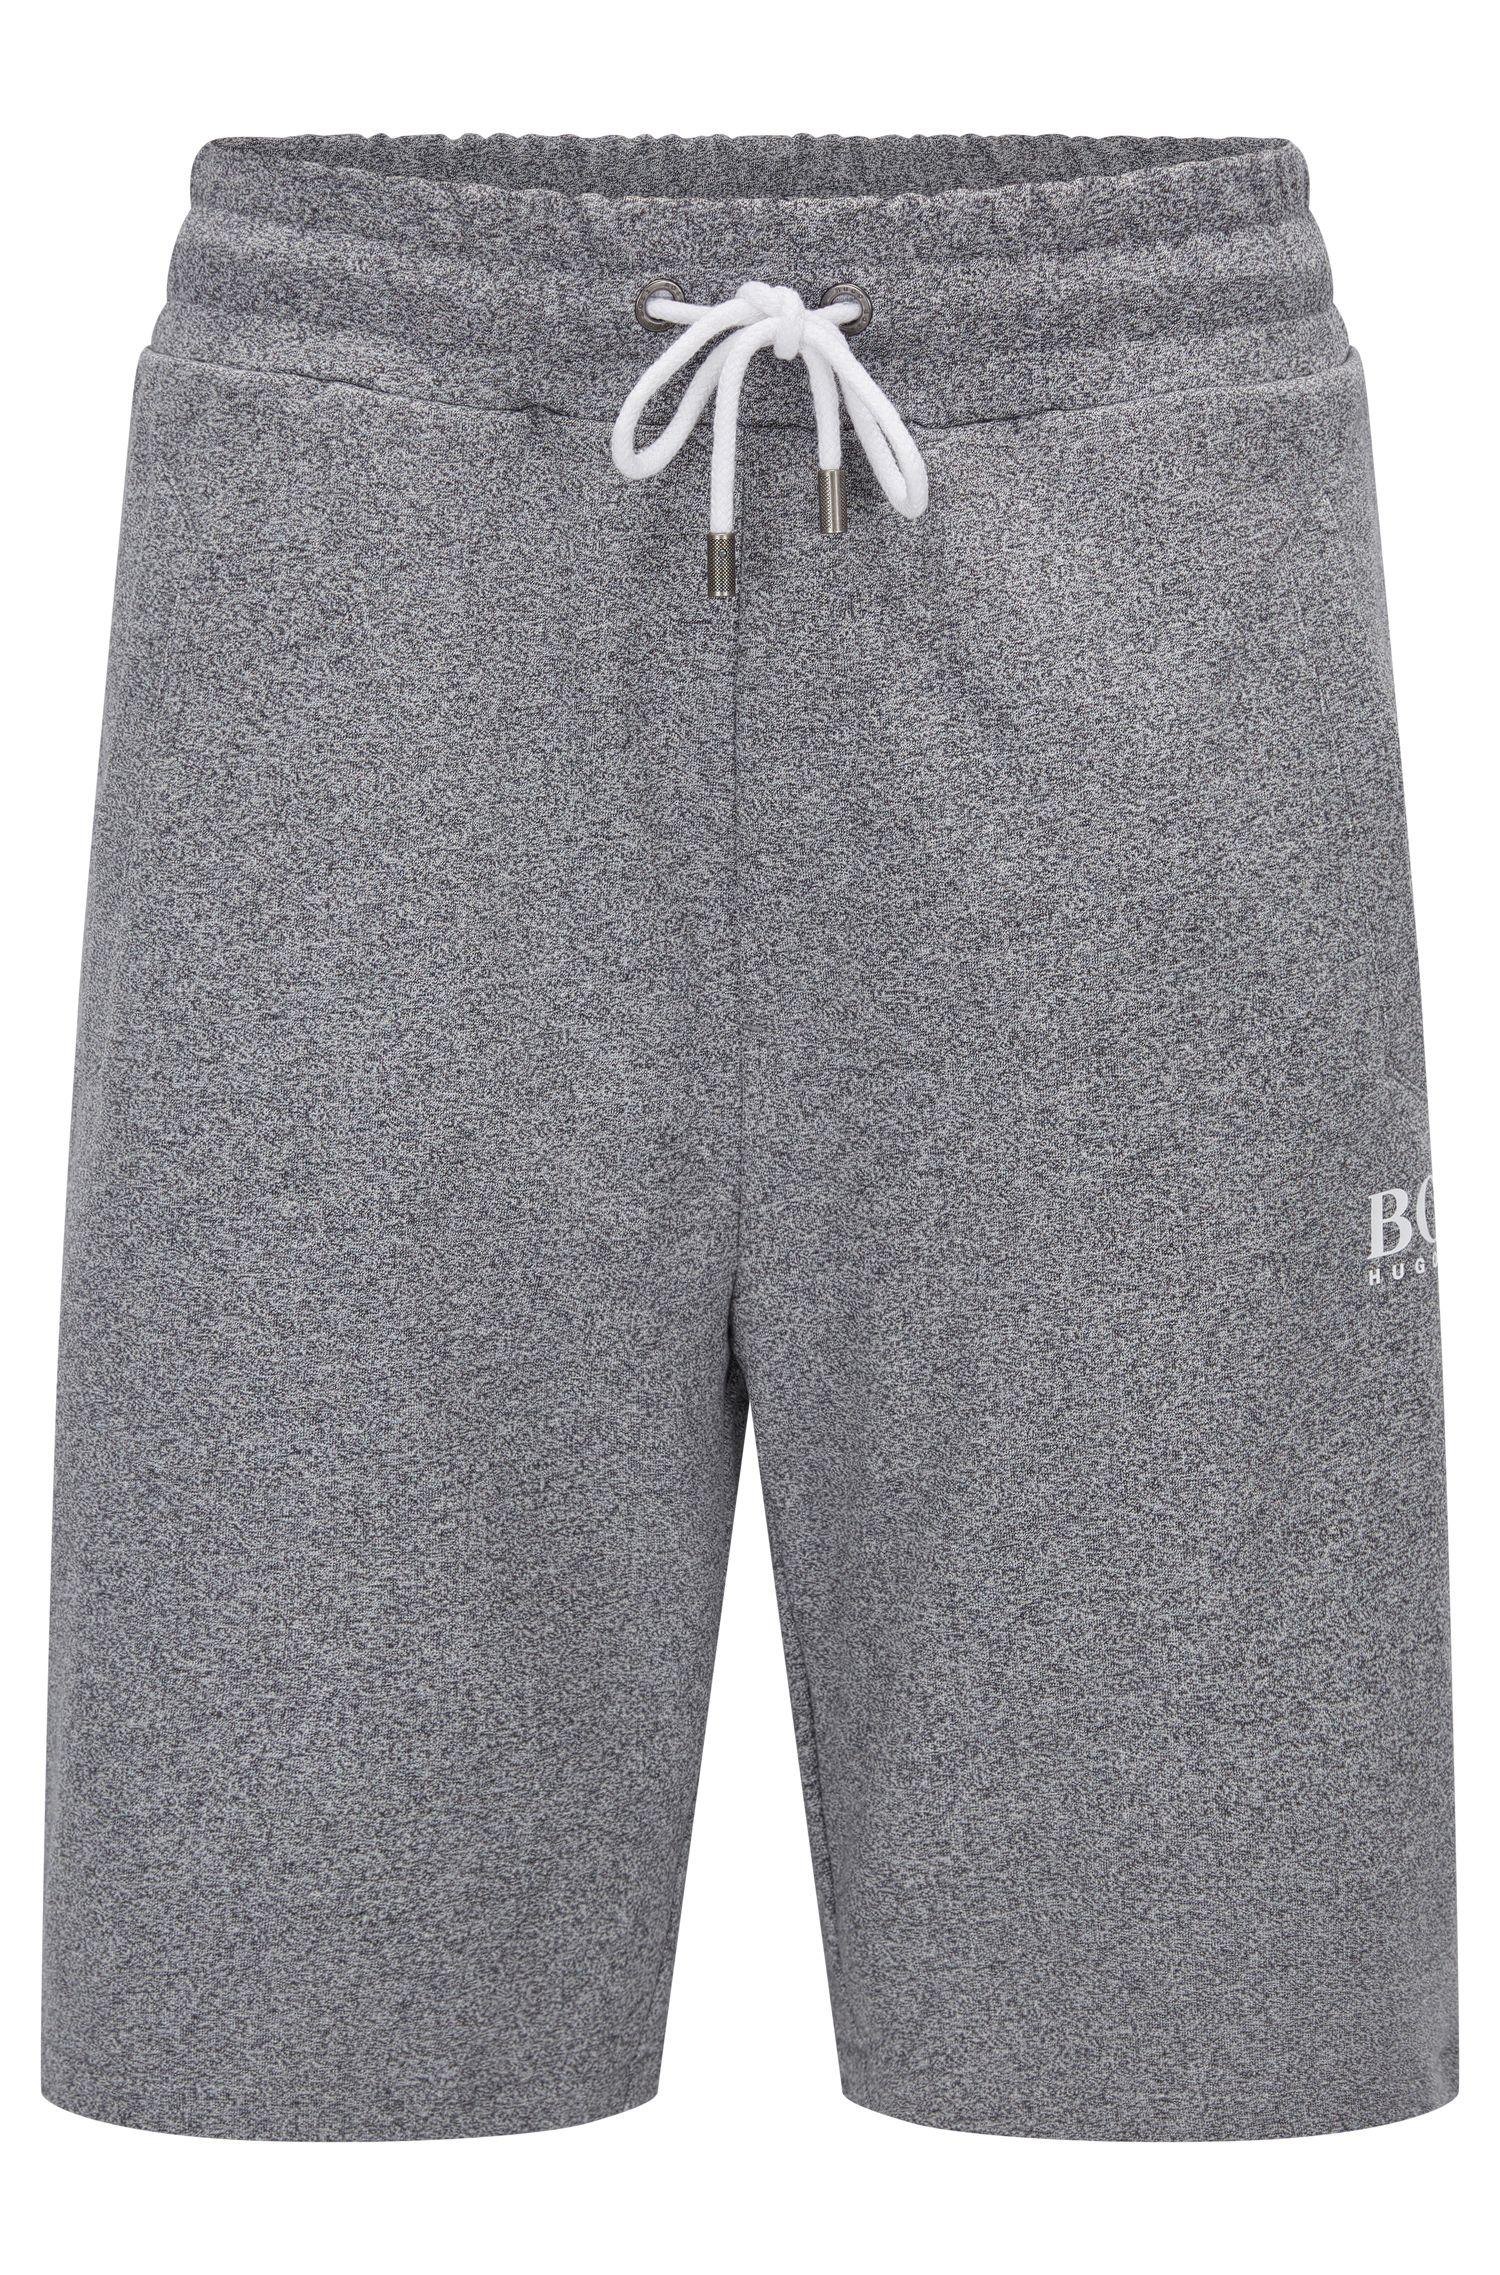 Heathered Cotton Sweatshort | Short Pant